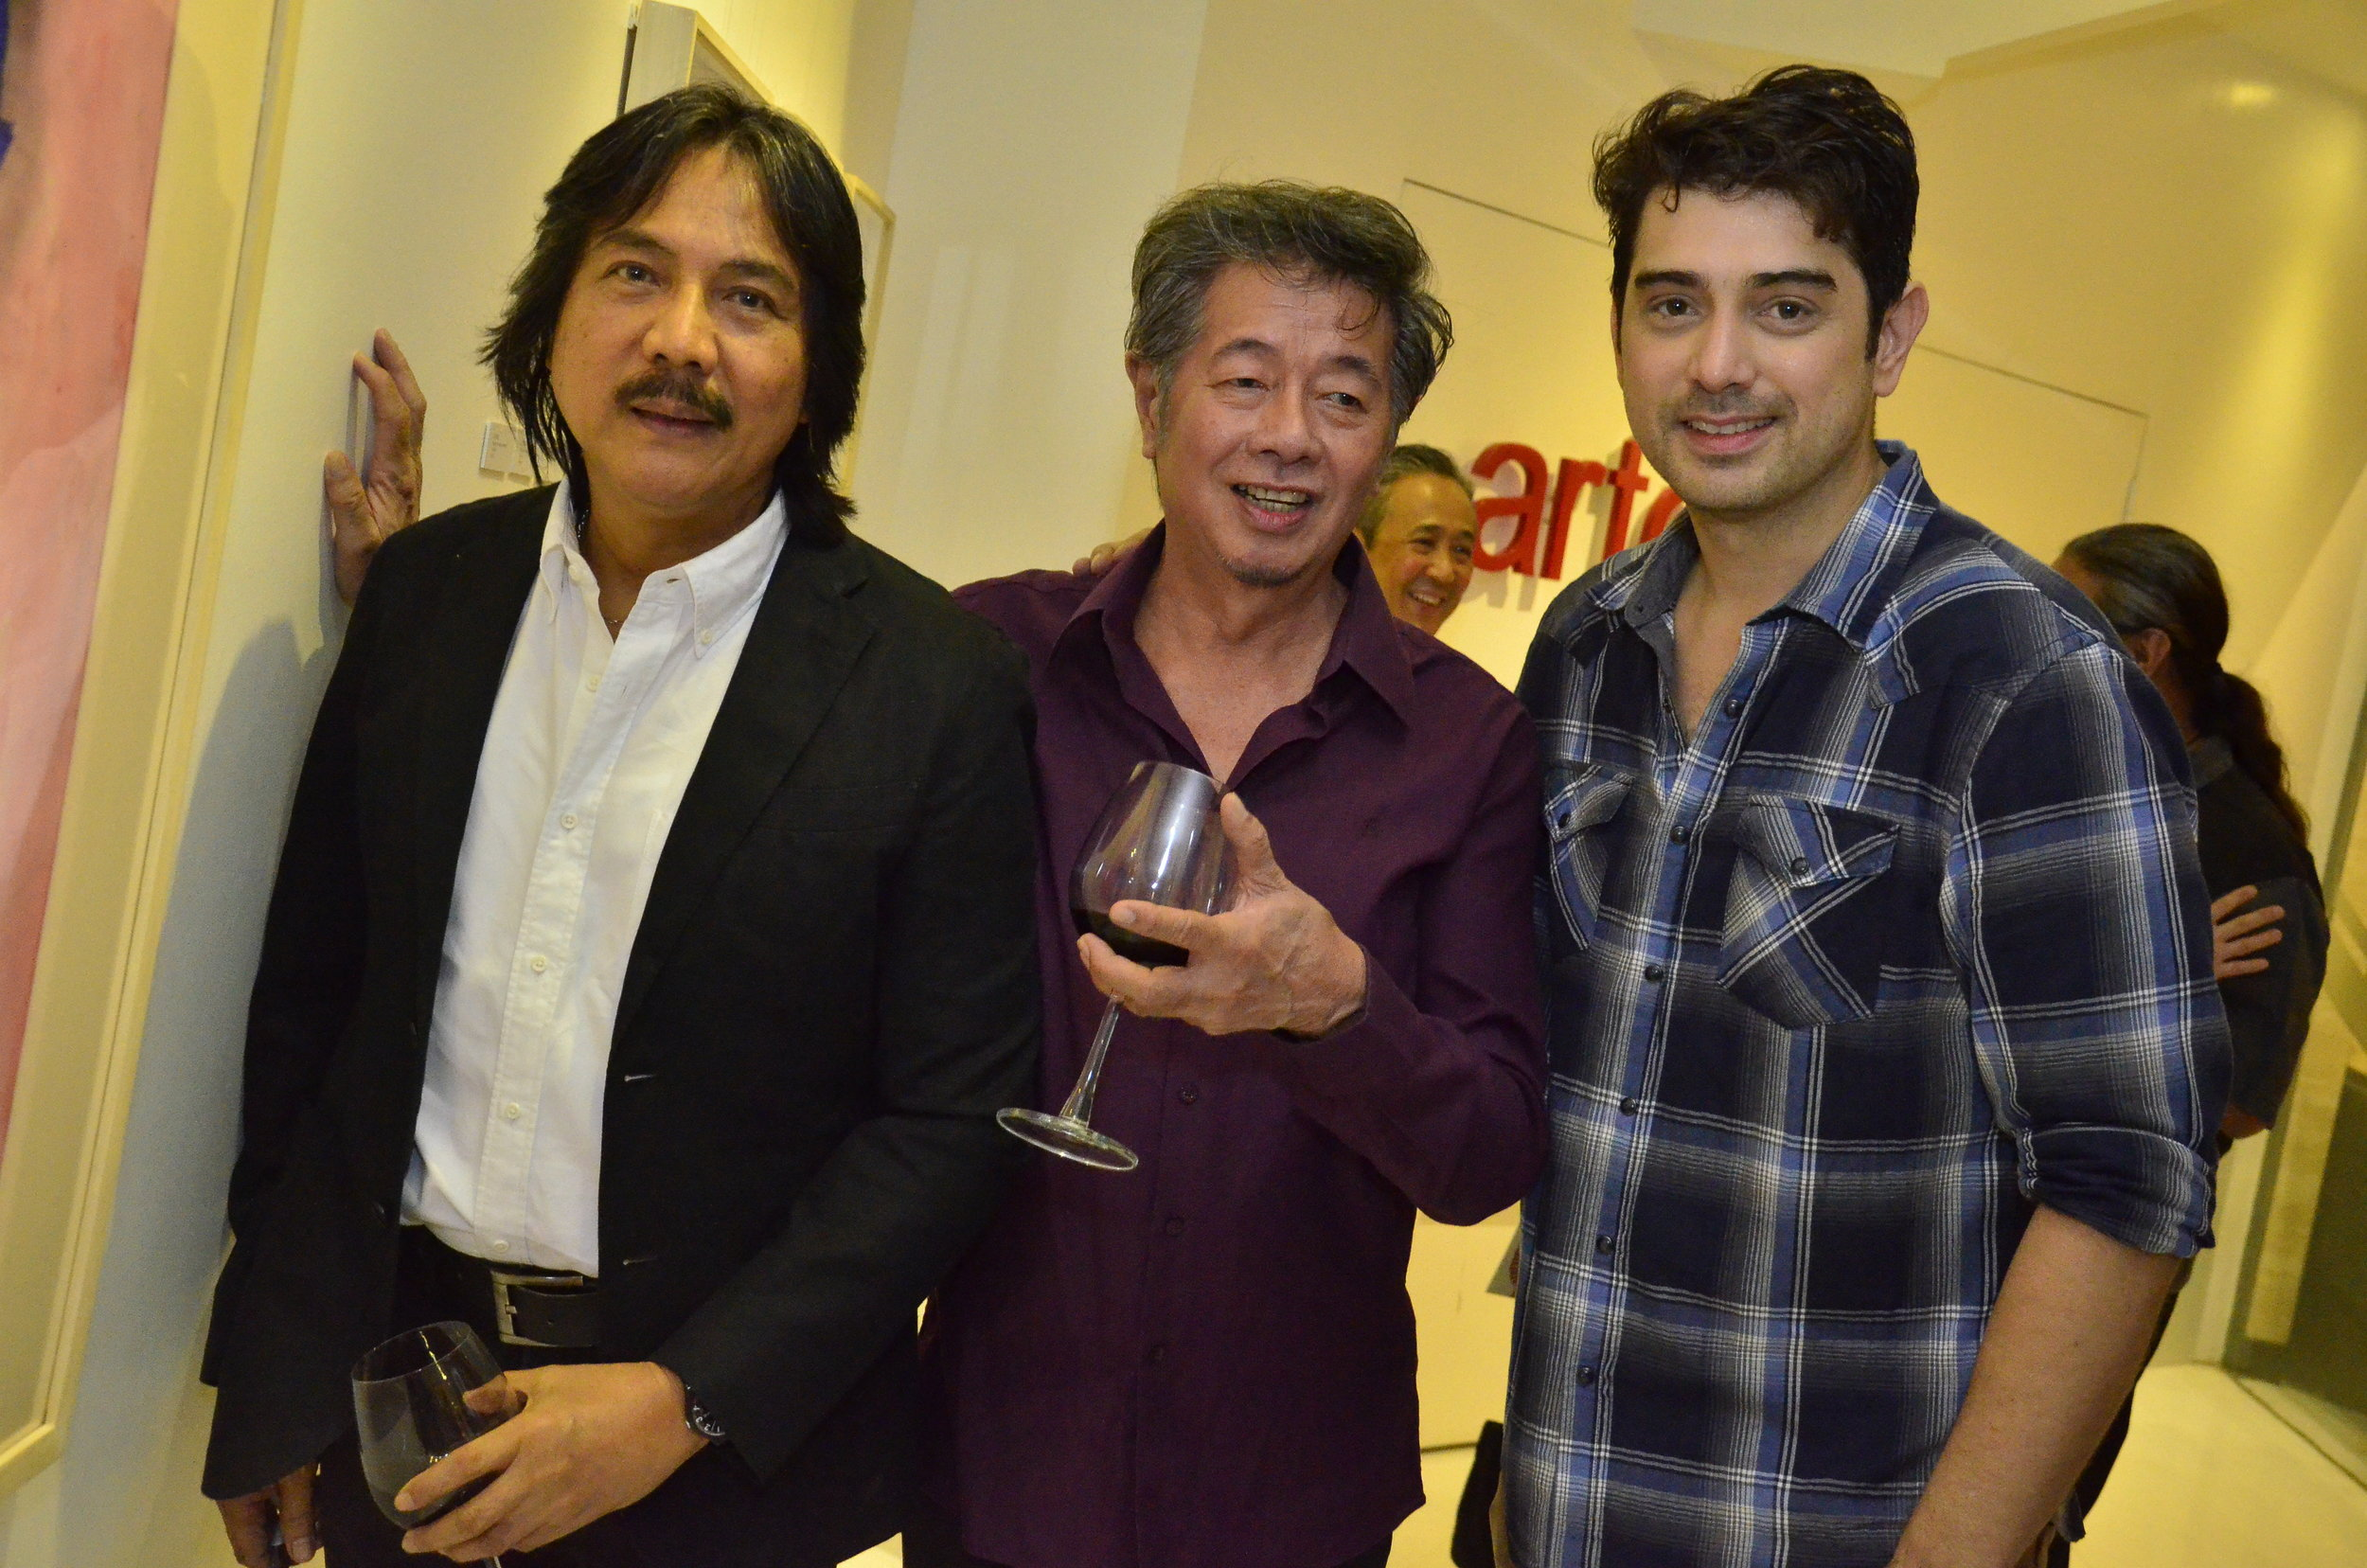 With Guest of Honor Nestor VInluan, Roy Veneracion and Ian Veneracion